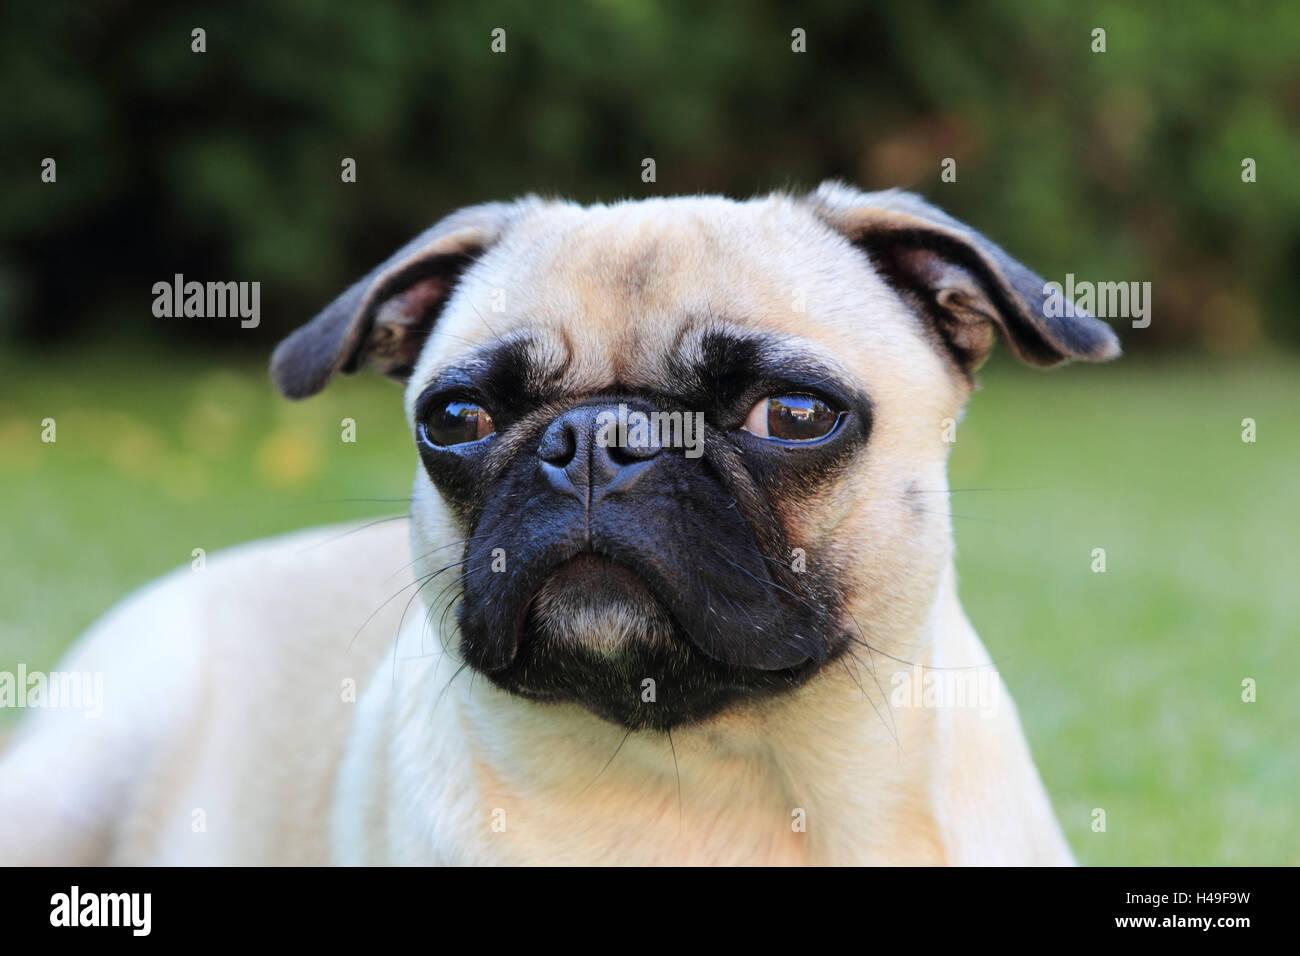 Pug, portrait, landscape format, mammal, animal, dog, pet, dog breed, - Stock Image